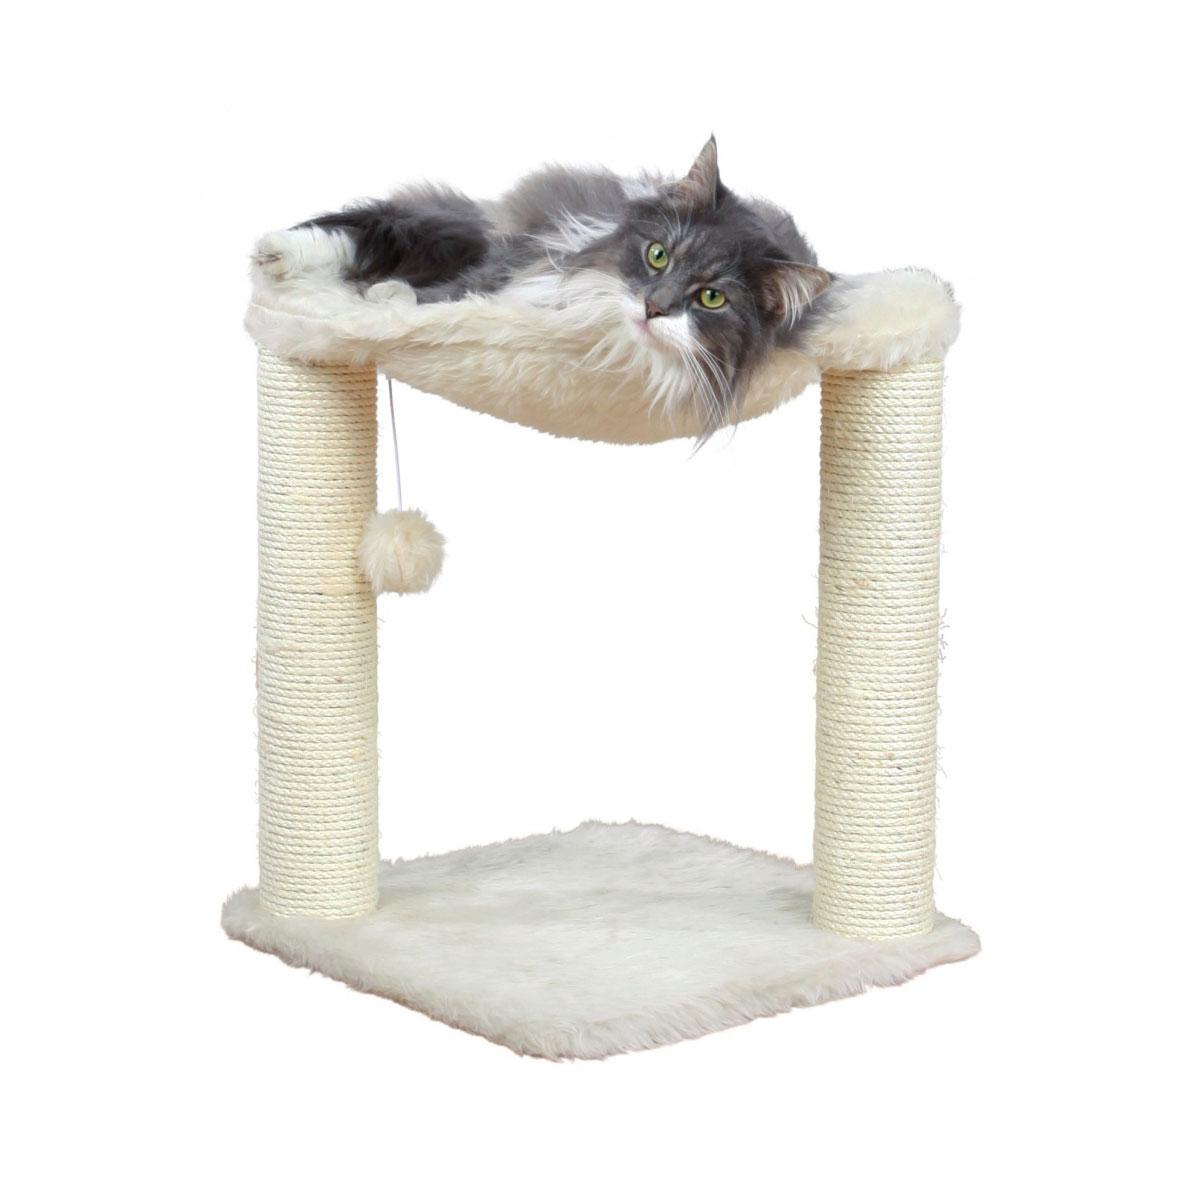 trixie kratzbaum baza 50cm langhaar creme kaufen bei zooroyal. Black Bedroom Furniture Sets. Home Design Ideas